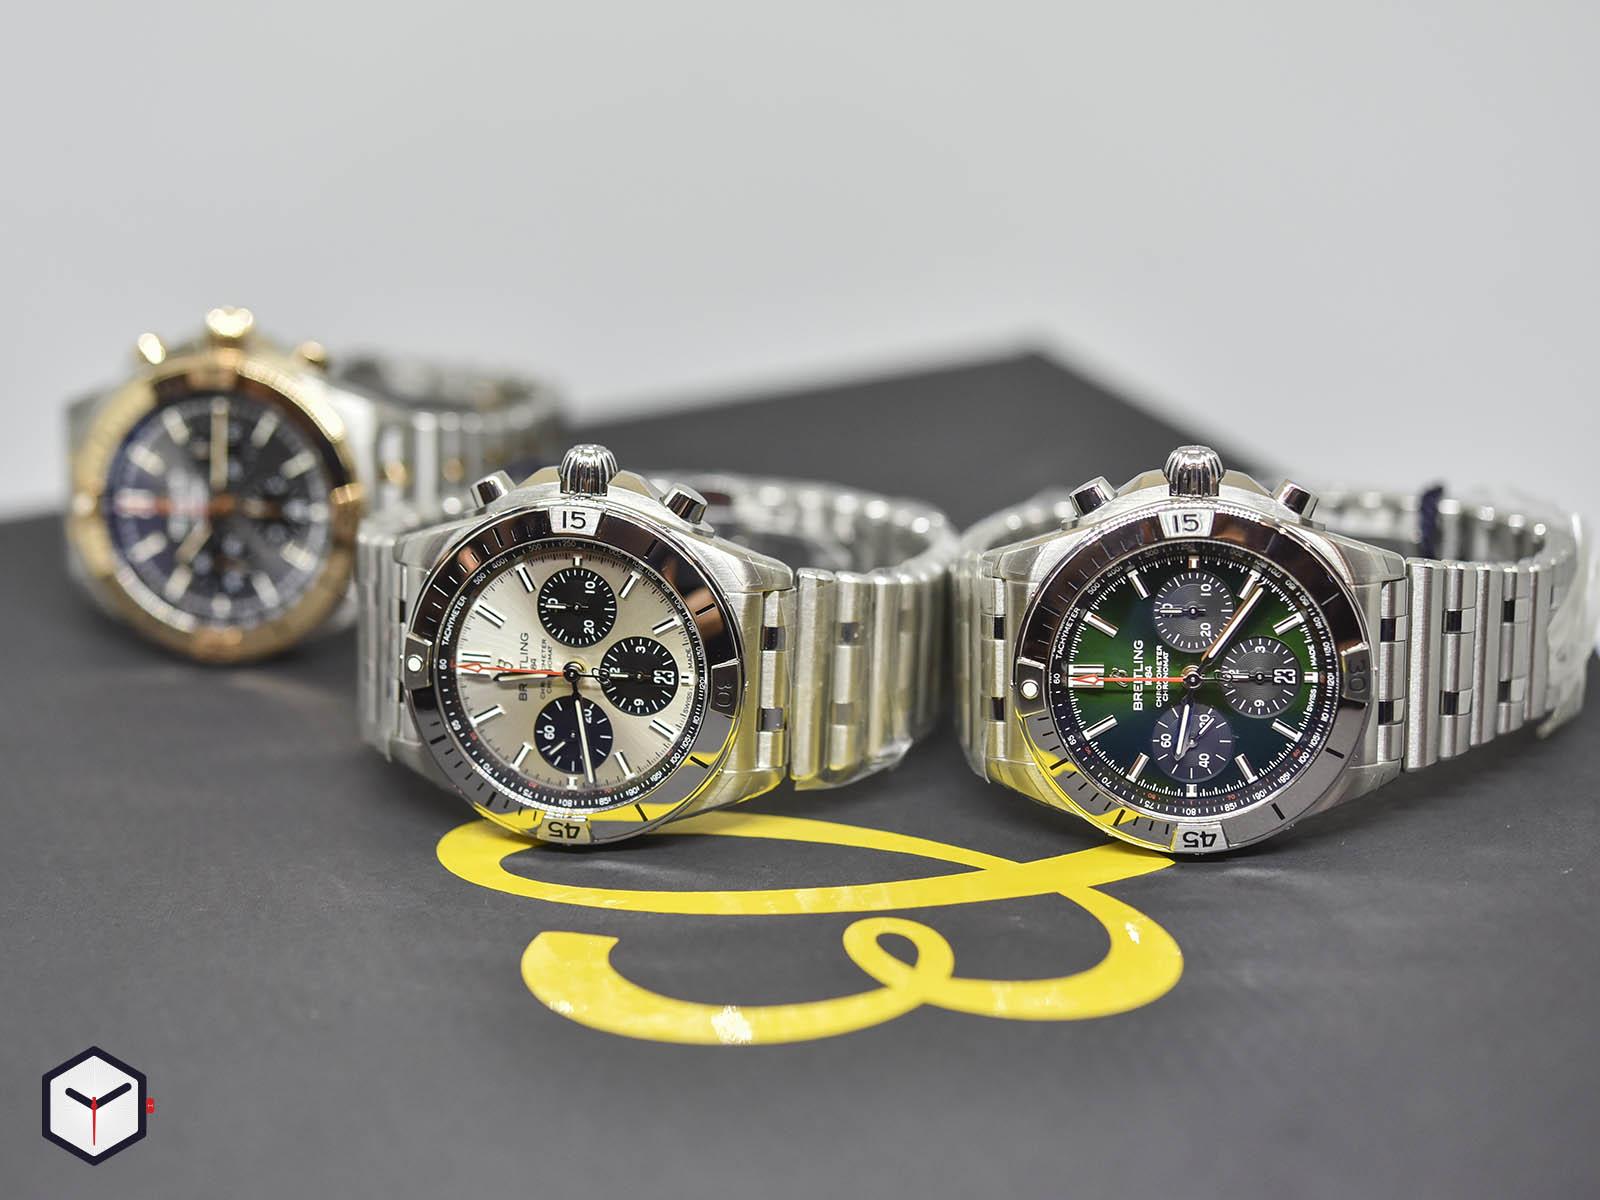 ub0134101b1u1-breitling-chronomat-chronograph-b01-42-8.jpg